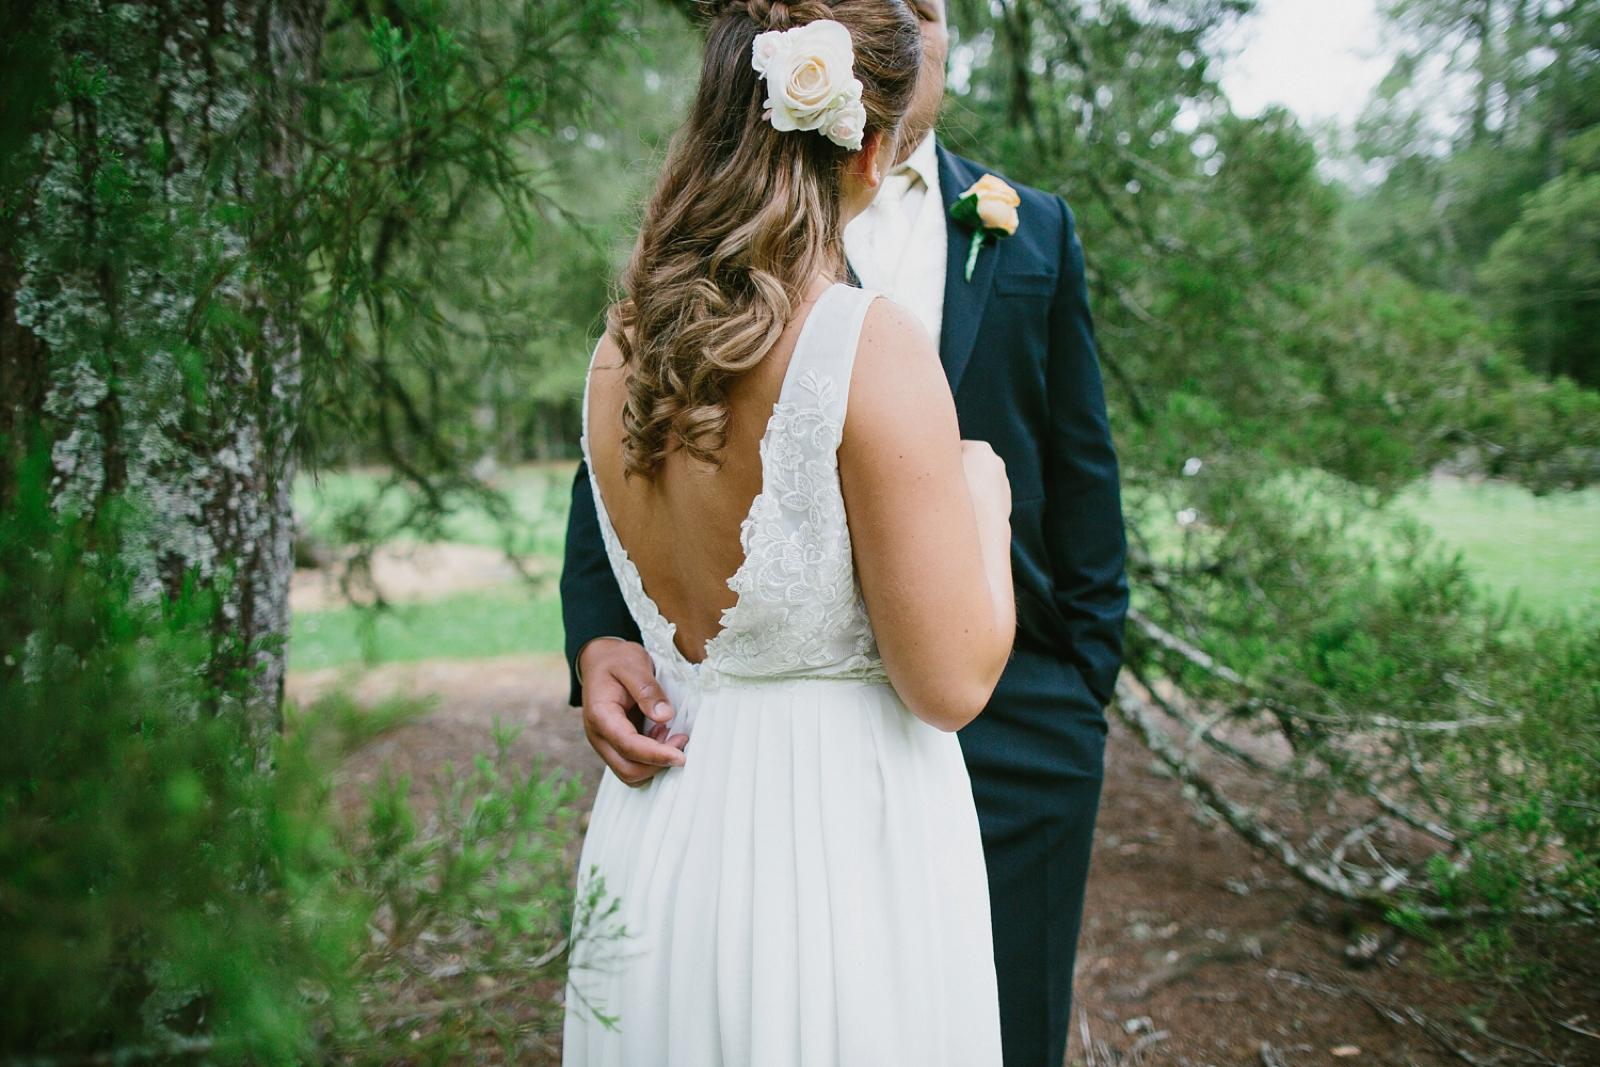 GabbyFiti_Auckland Wedding Photographer_Patty Lagera_0086.jpg